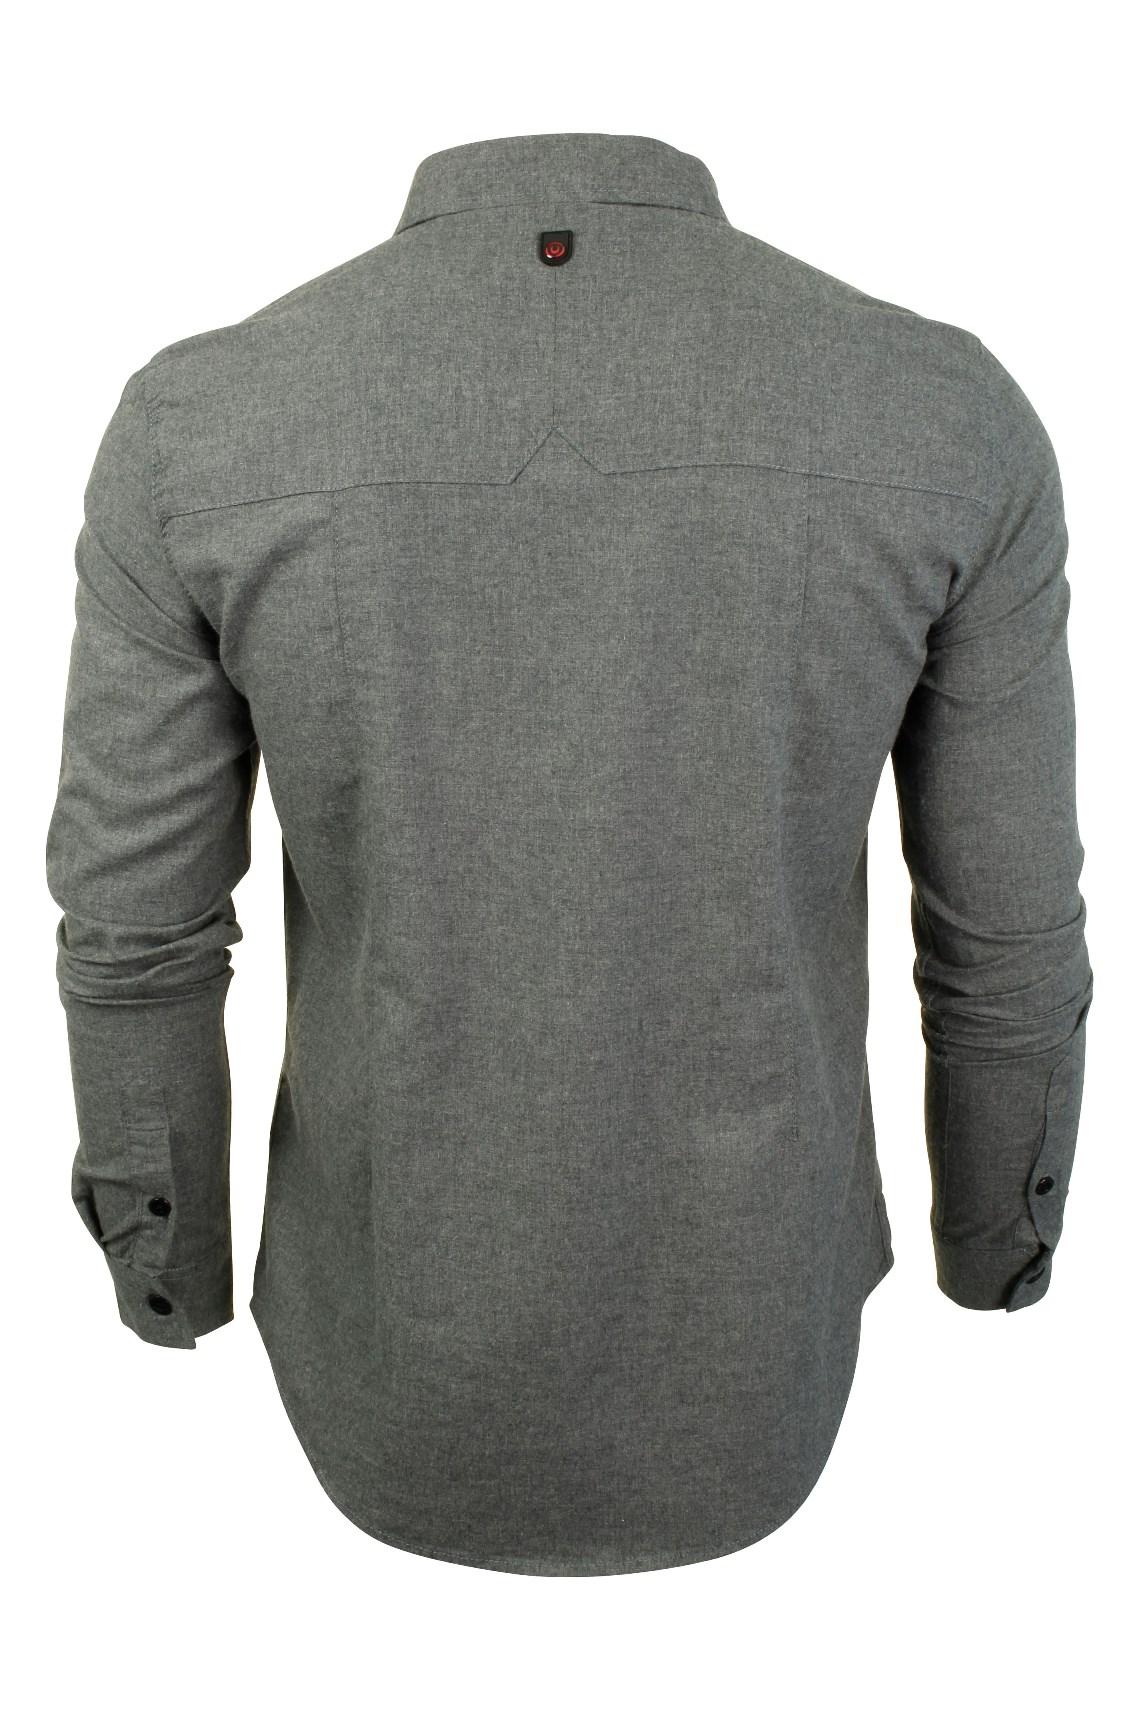 Para-Hombre-Franela-Camisa-por-Pato-Y-Cubierta-039-Katlego-039-Manga-Larga miniatura 8